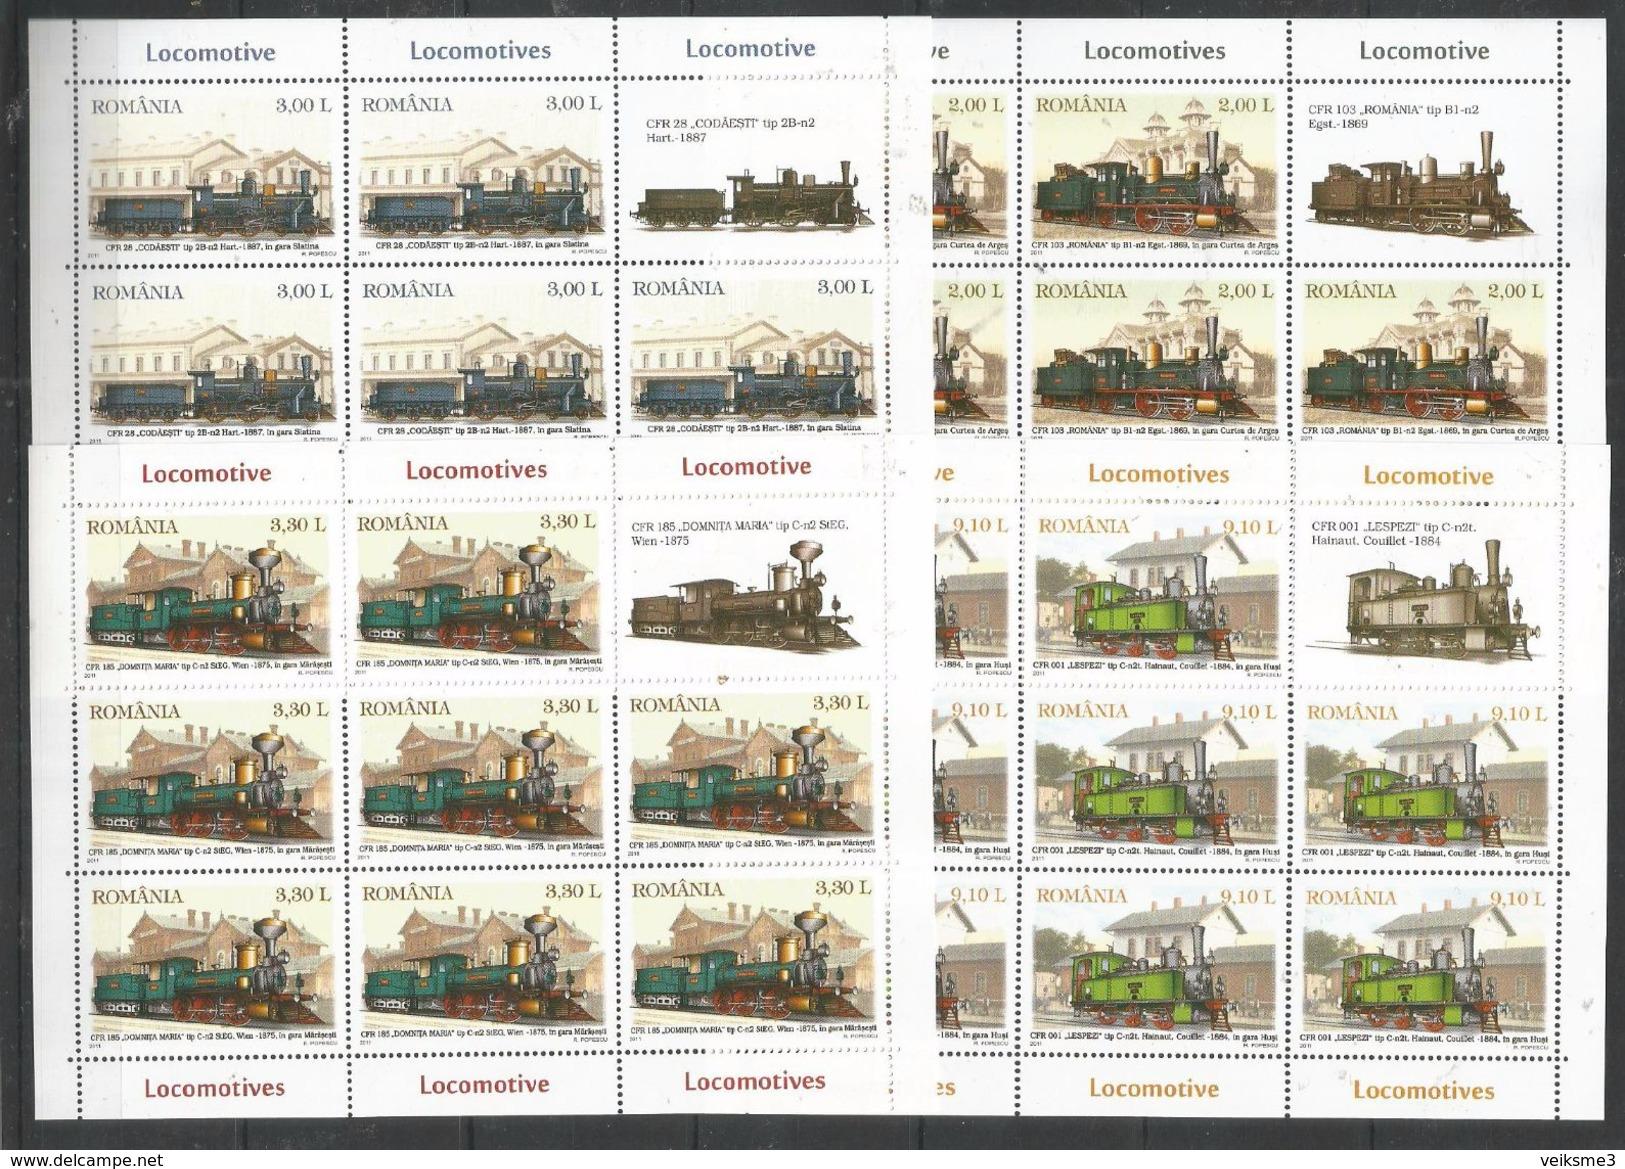 8x ROMANIA - MNH - Transport - Trains - Locomotives - Eisenbahnen